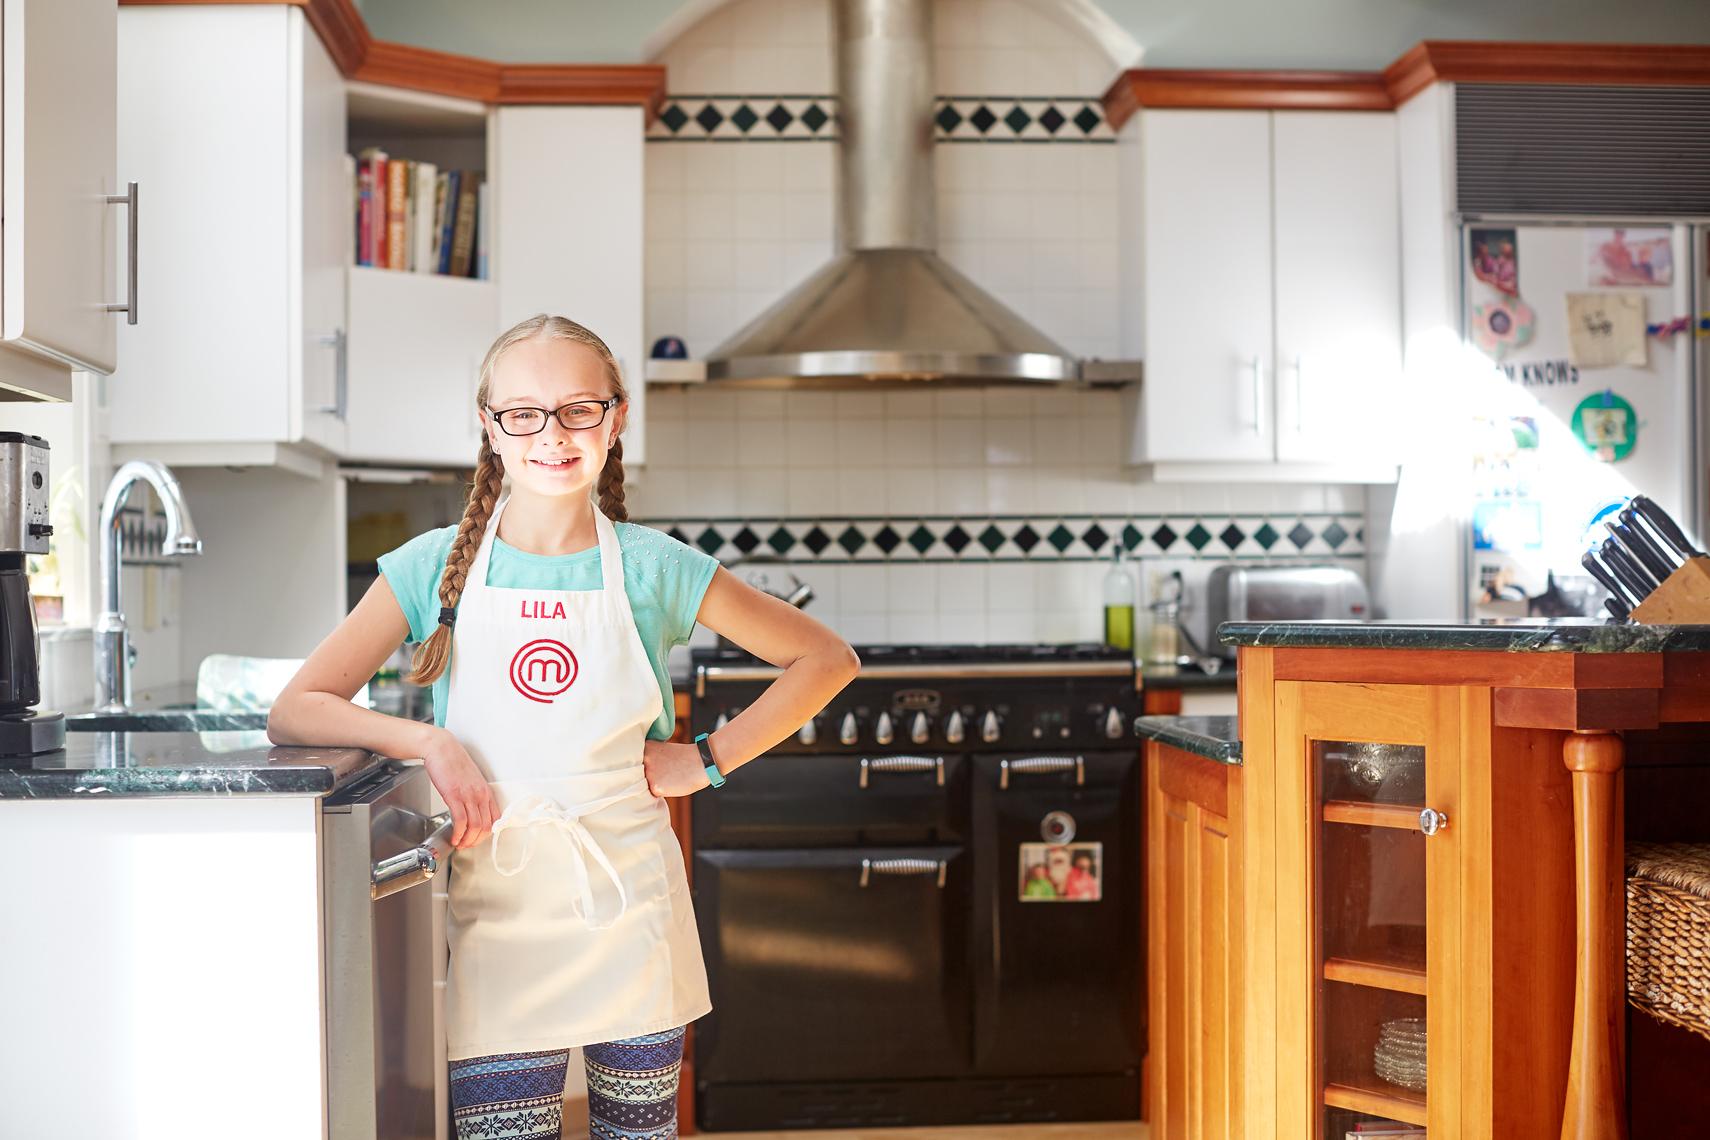 MasterChef Junior  contestant Lila DeLuca in her Rockport kitchen. (Photograph by Jonathan Kozowyk)